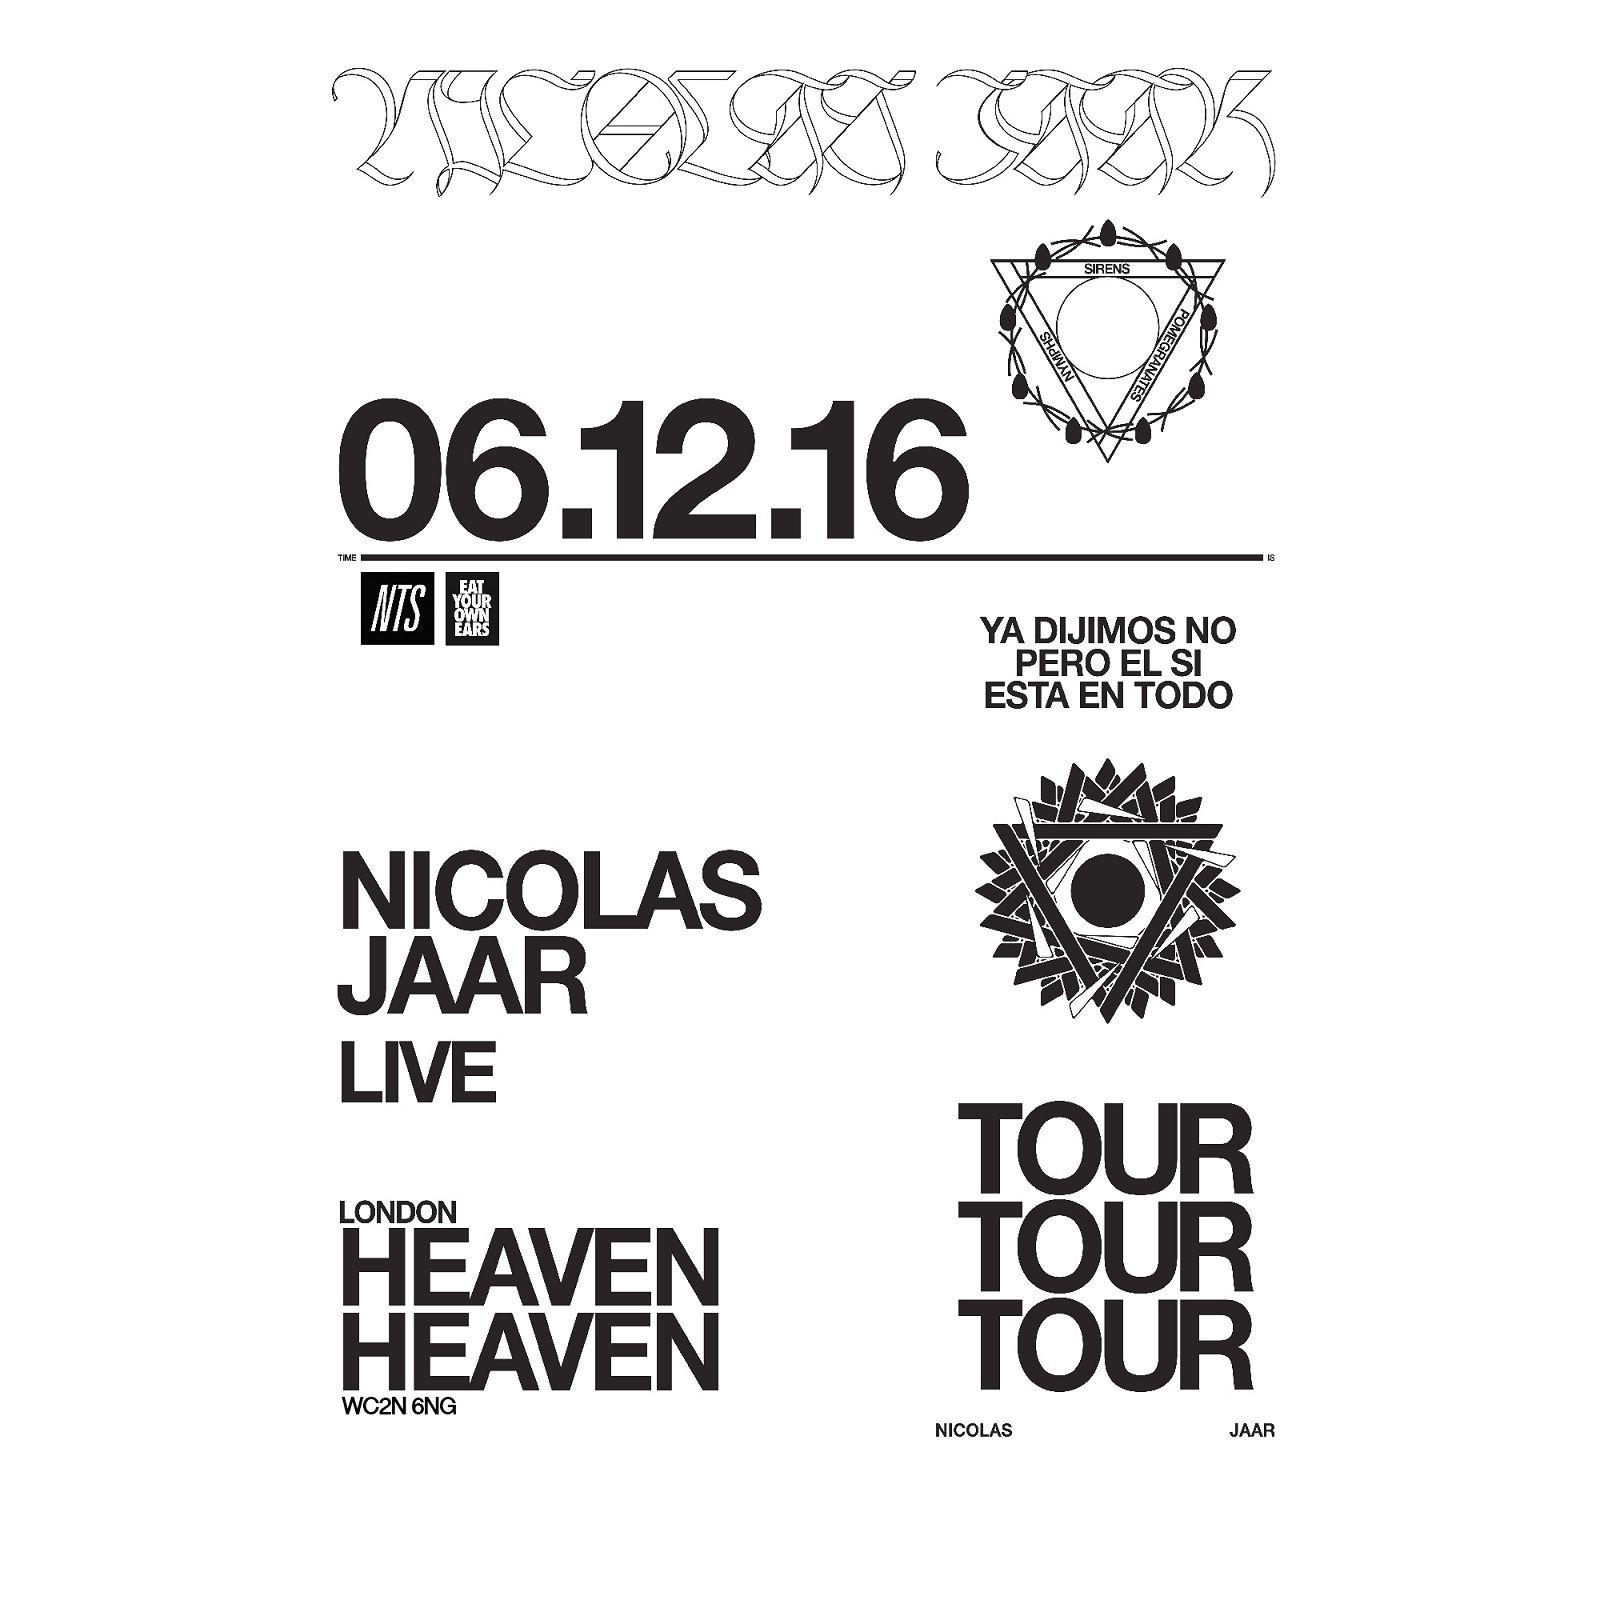 Nicolas-Jarr-Live-at-Heaven-NTS-06.12.16-Artwork.jpg